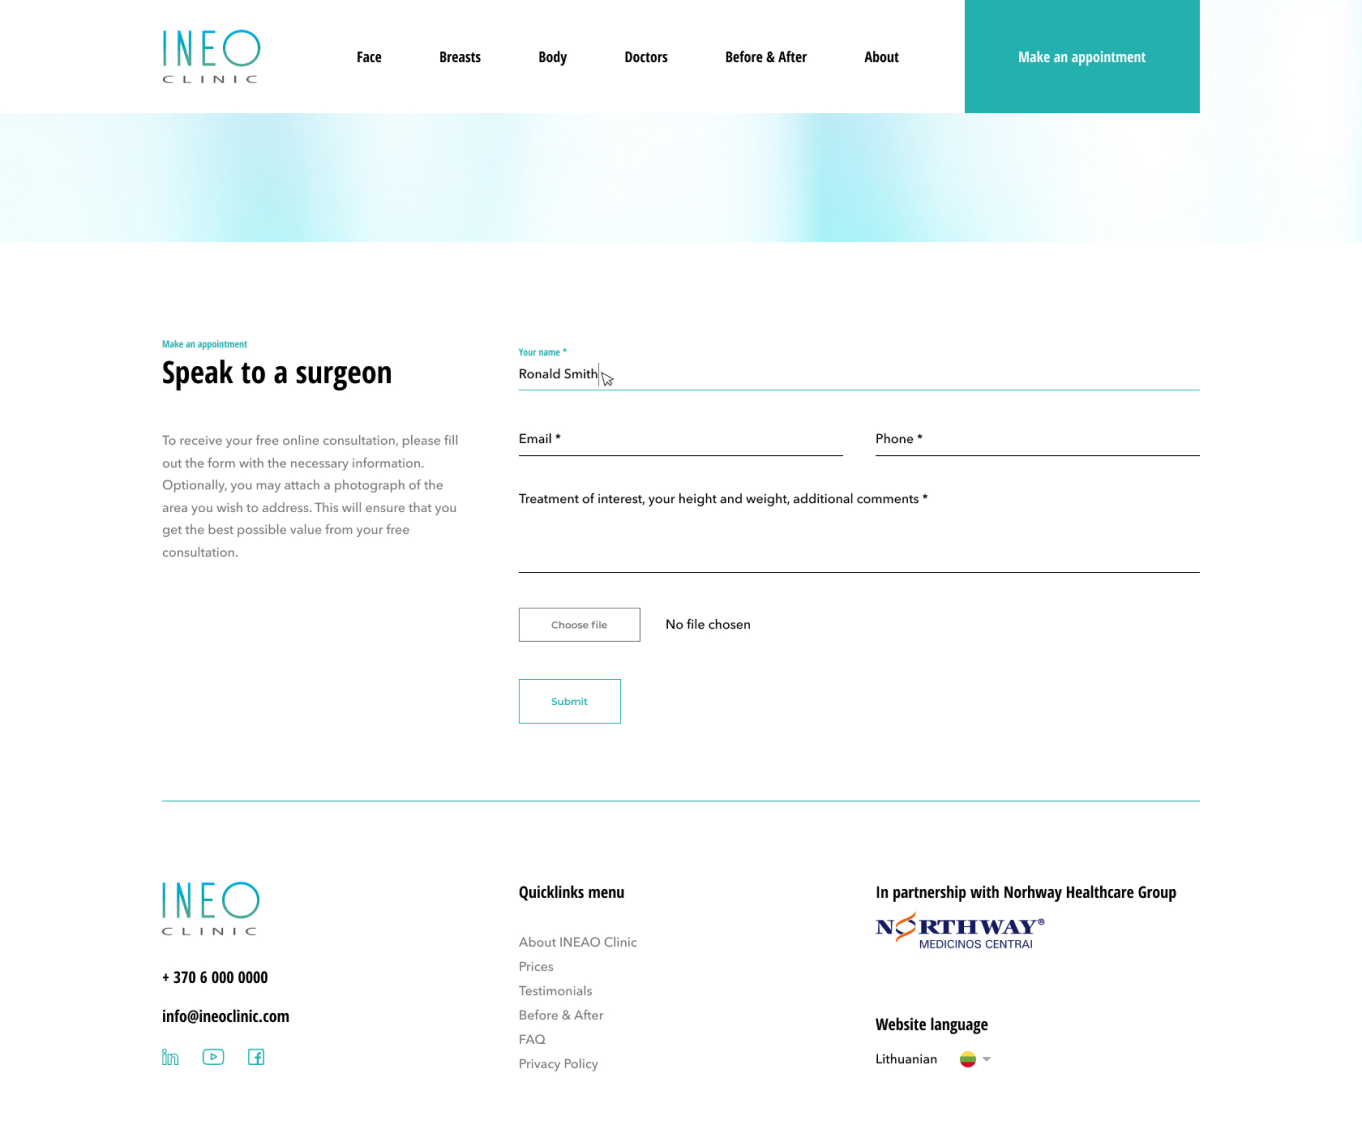 INEO Clinic website design file